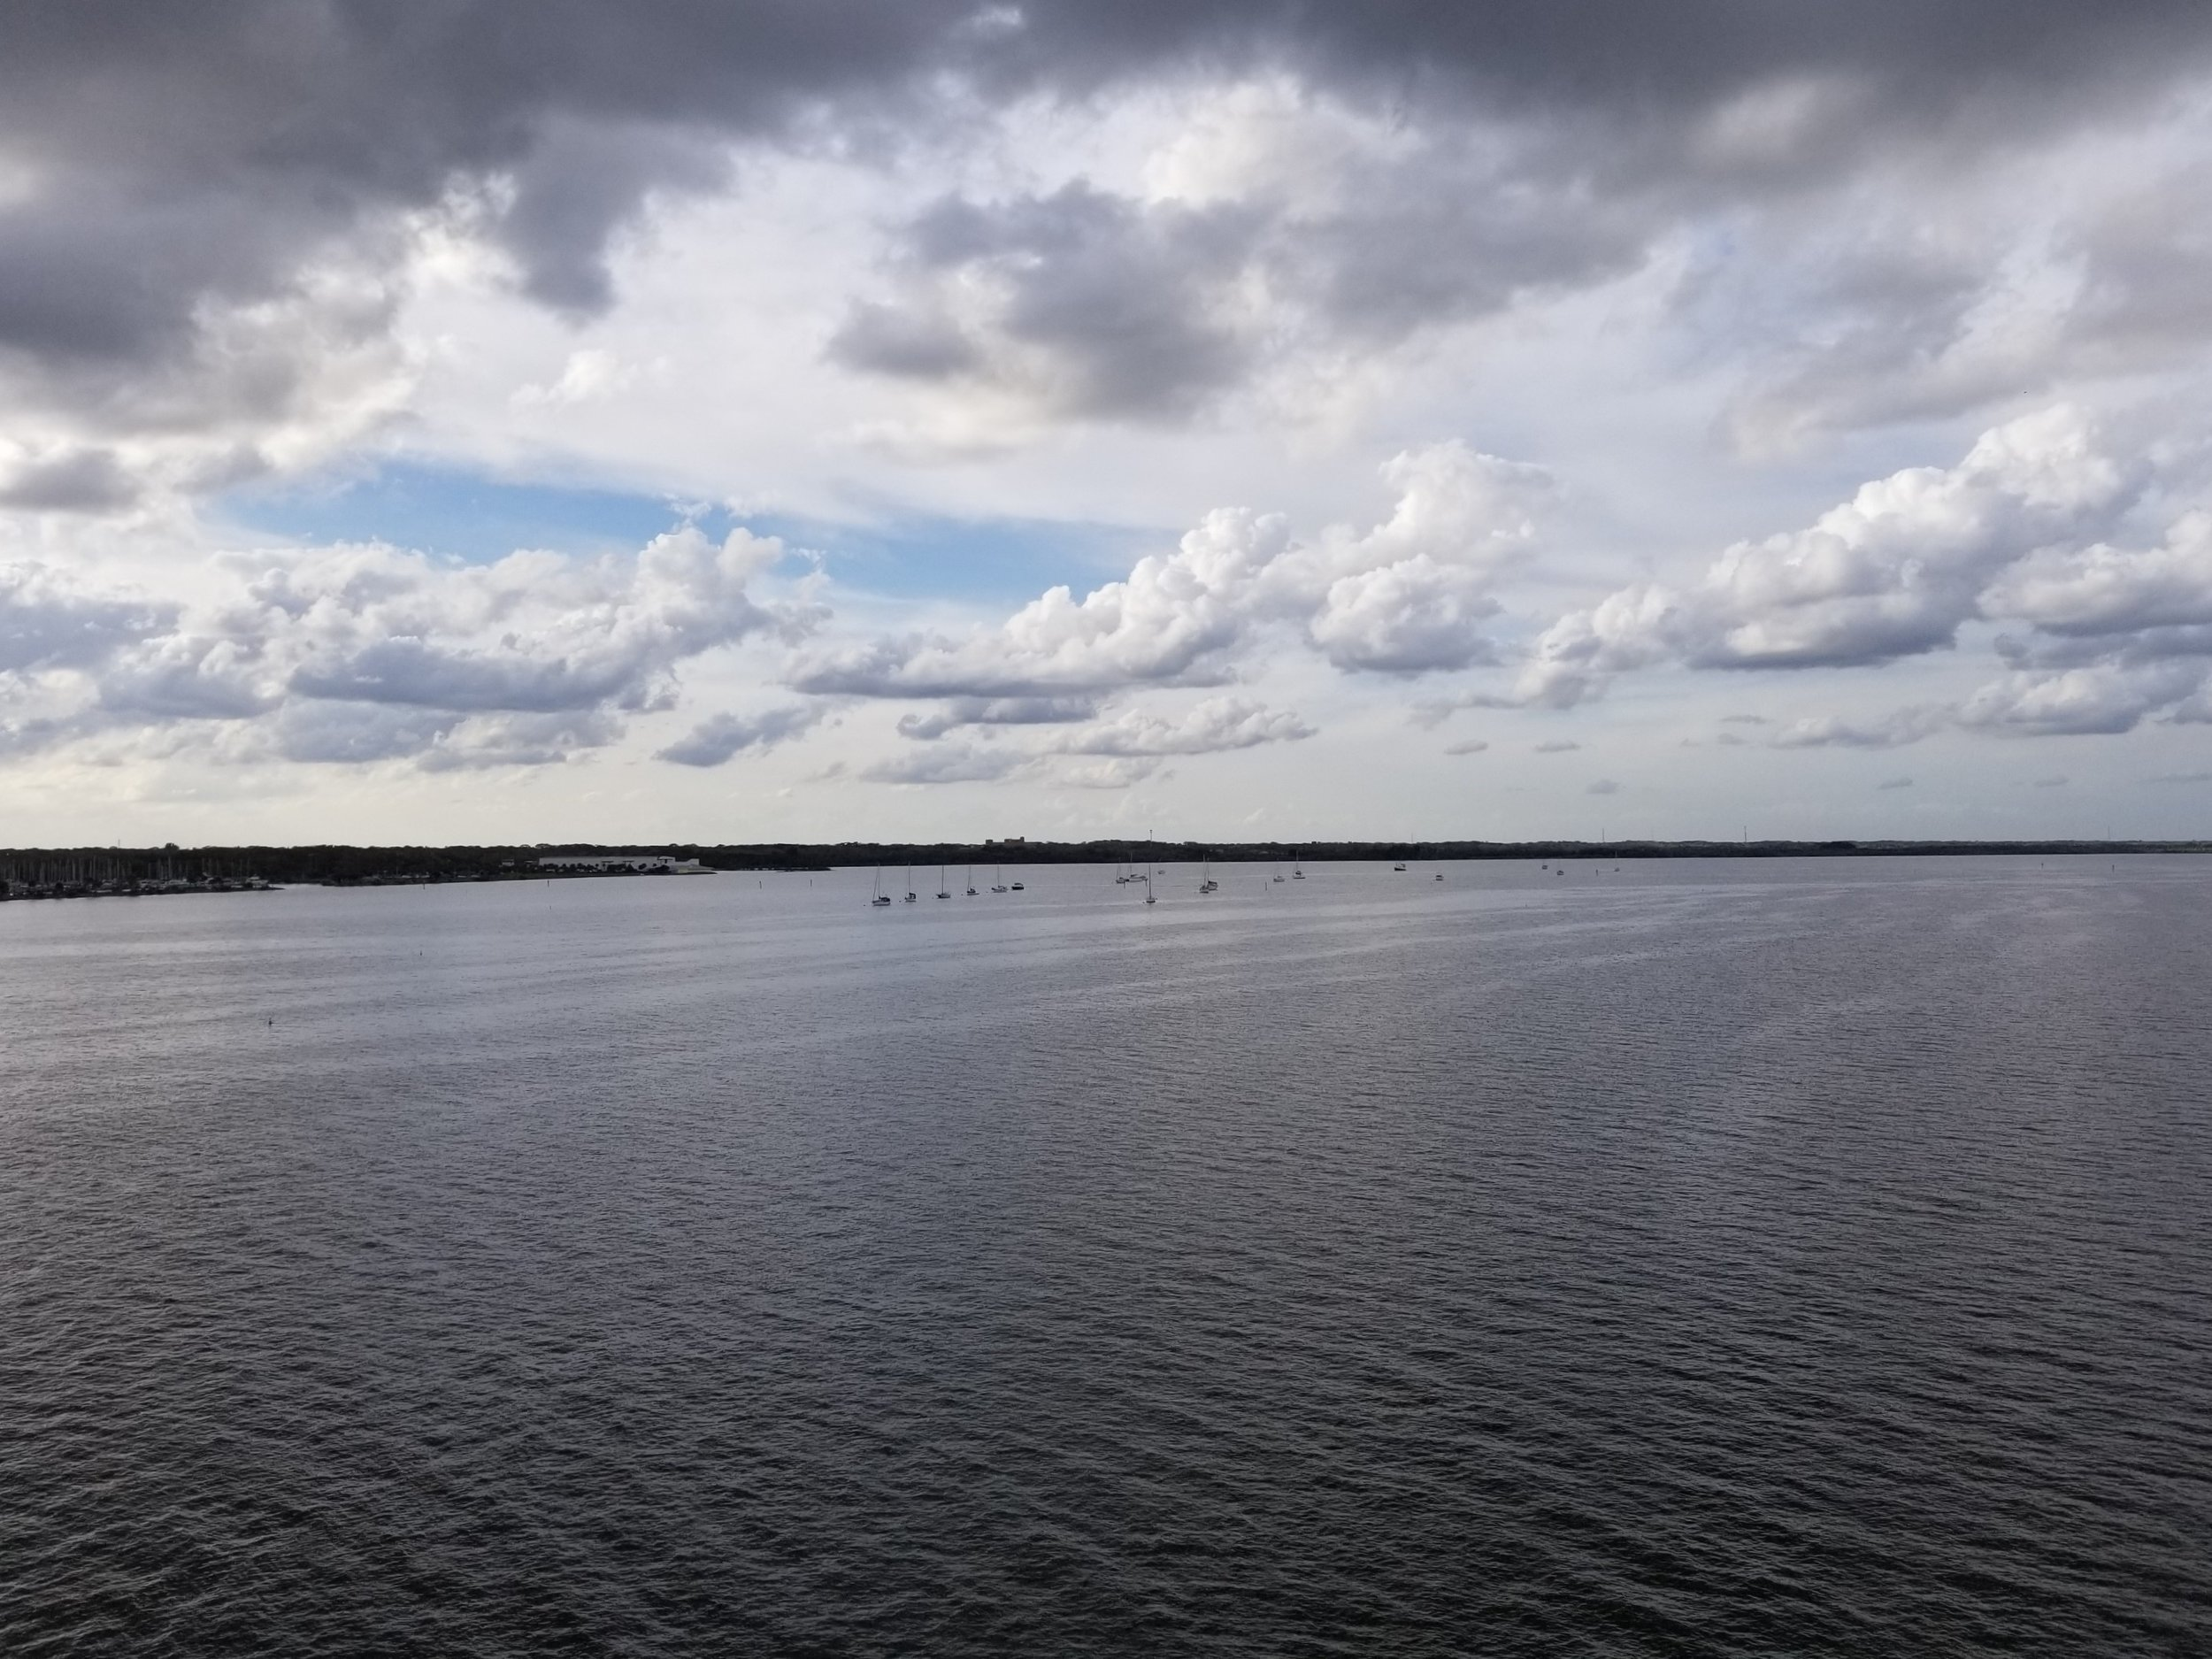 To the northwest, the Titusville Marina mooring field.